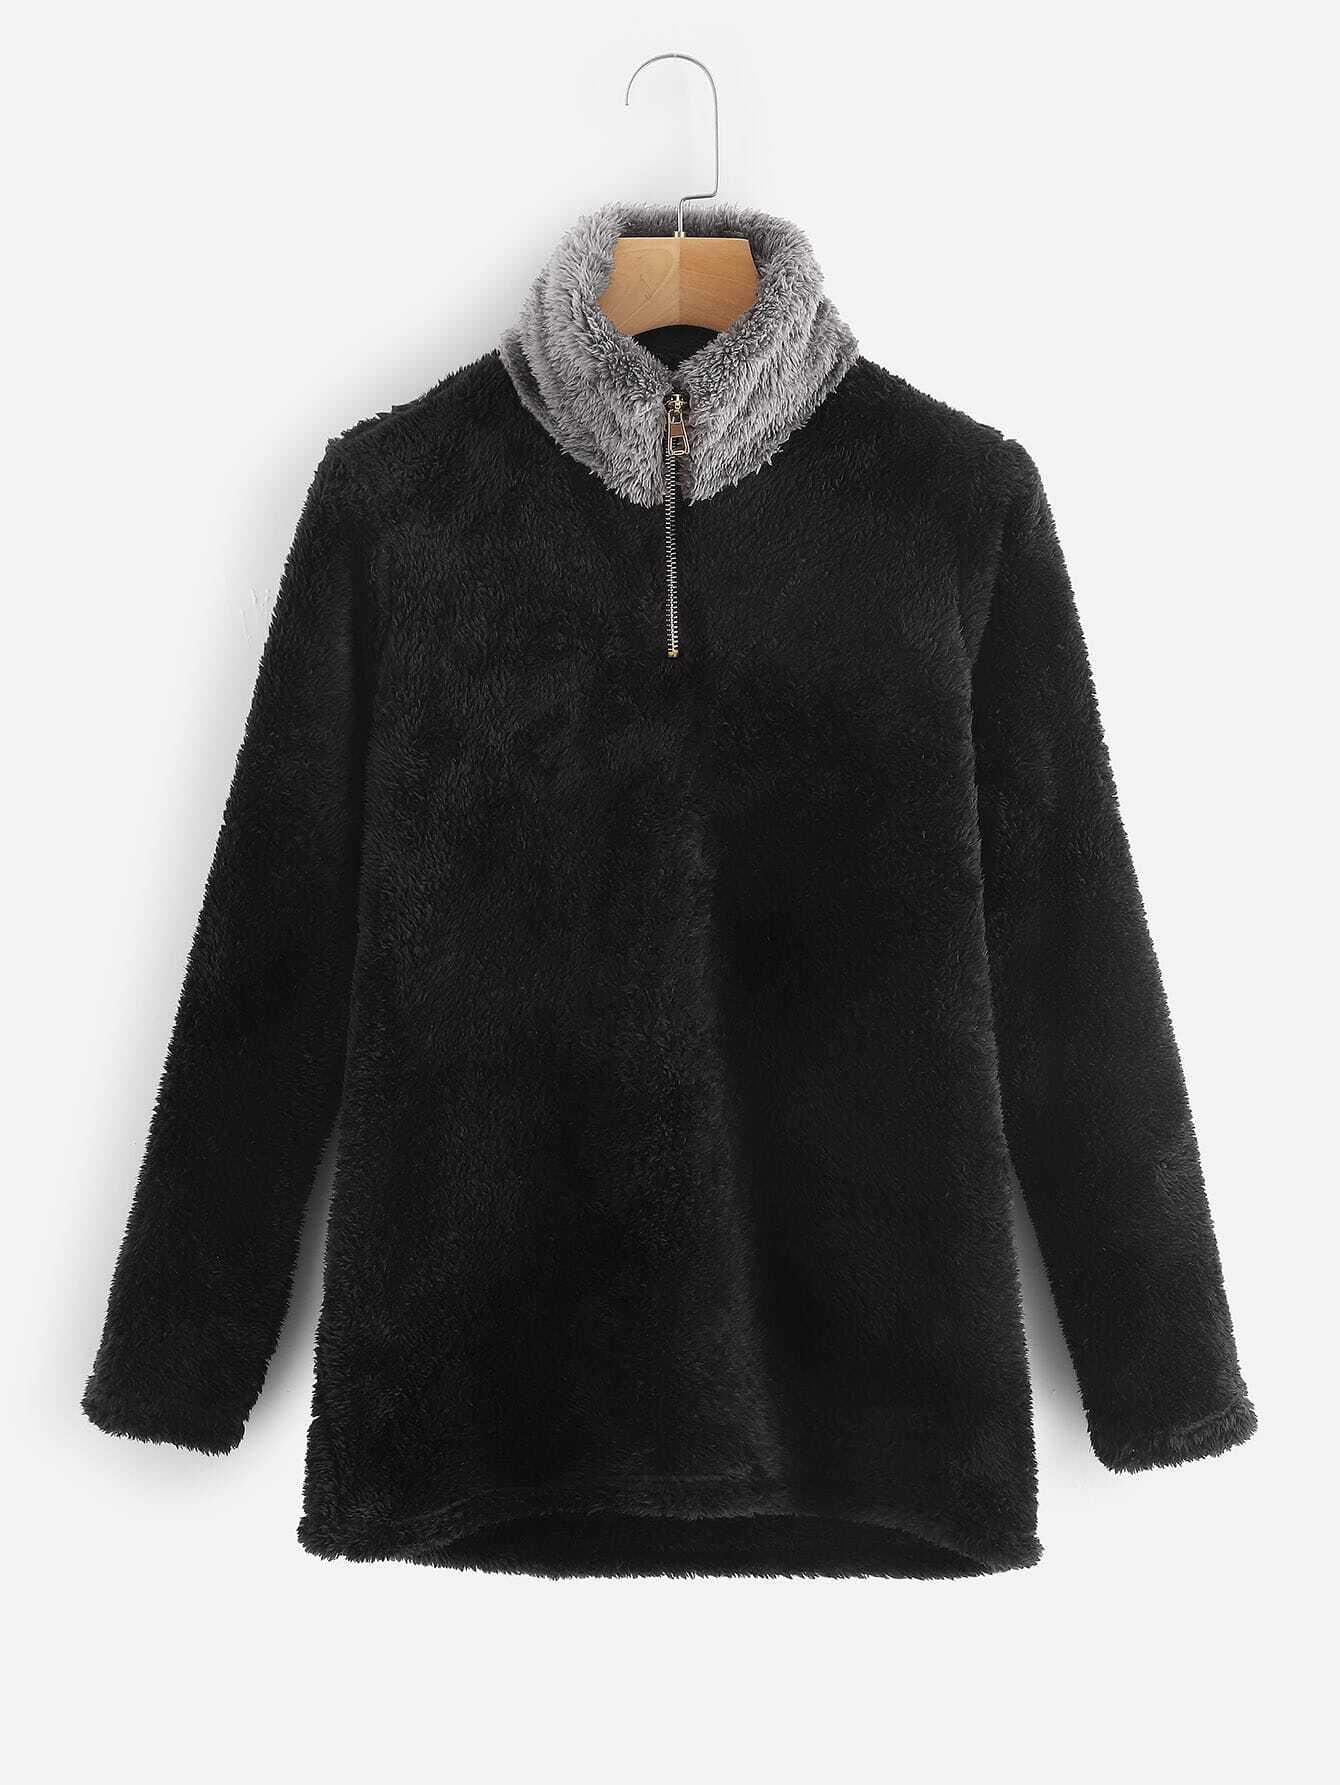 Фото - Плюс размера плюшевая куртка на молнии от SheIn черного цвета